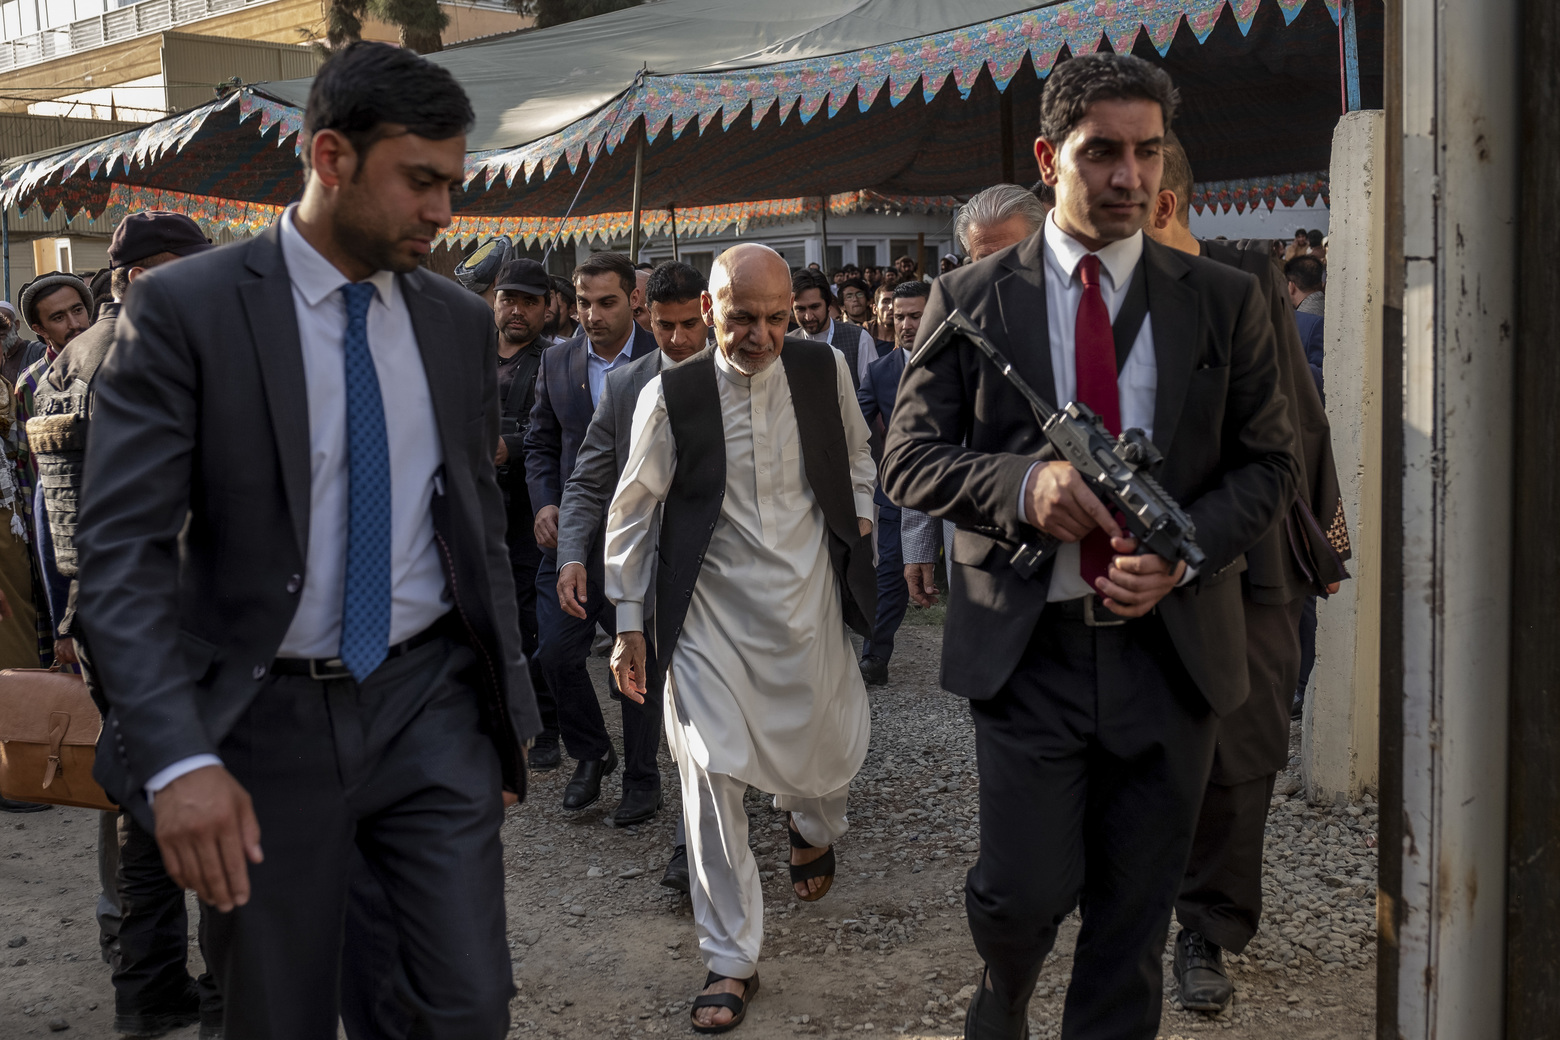 «Талибан» решил амнистировать Ашрафа Гани и Амрулу Салеха